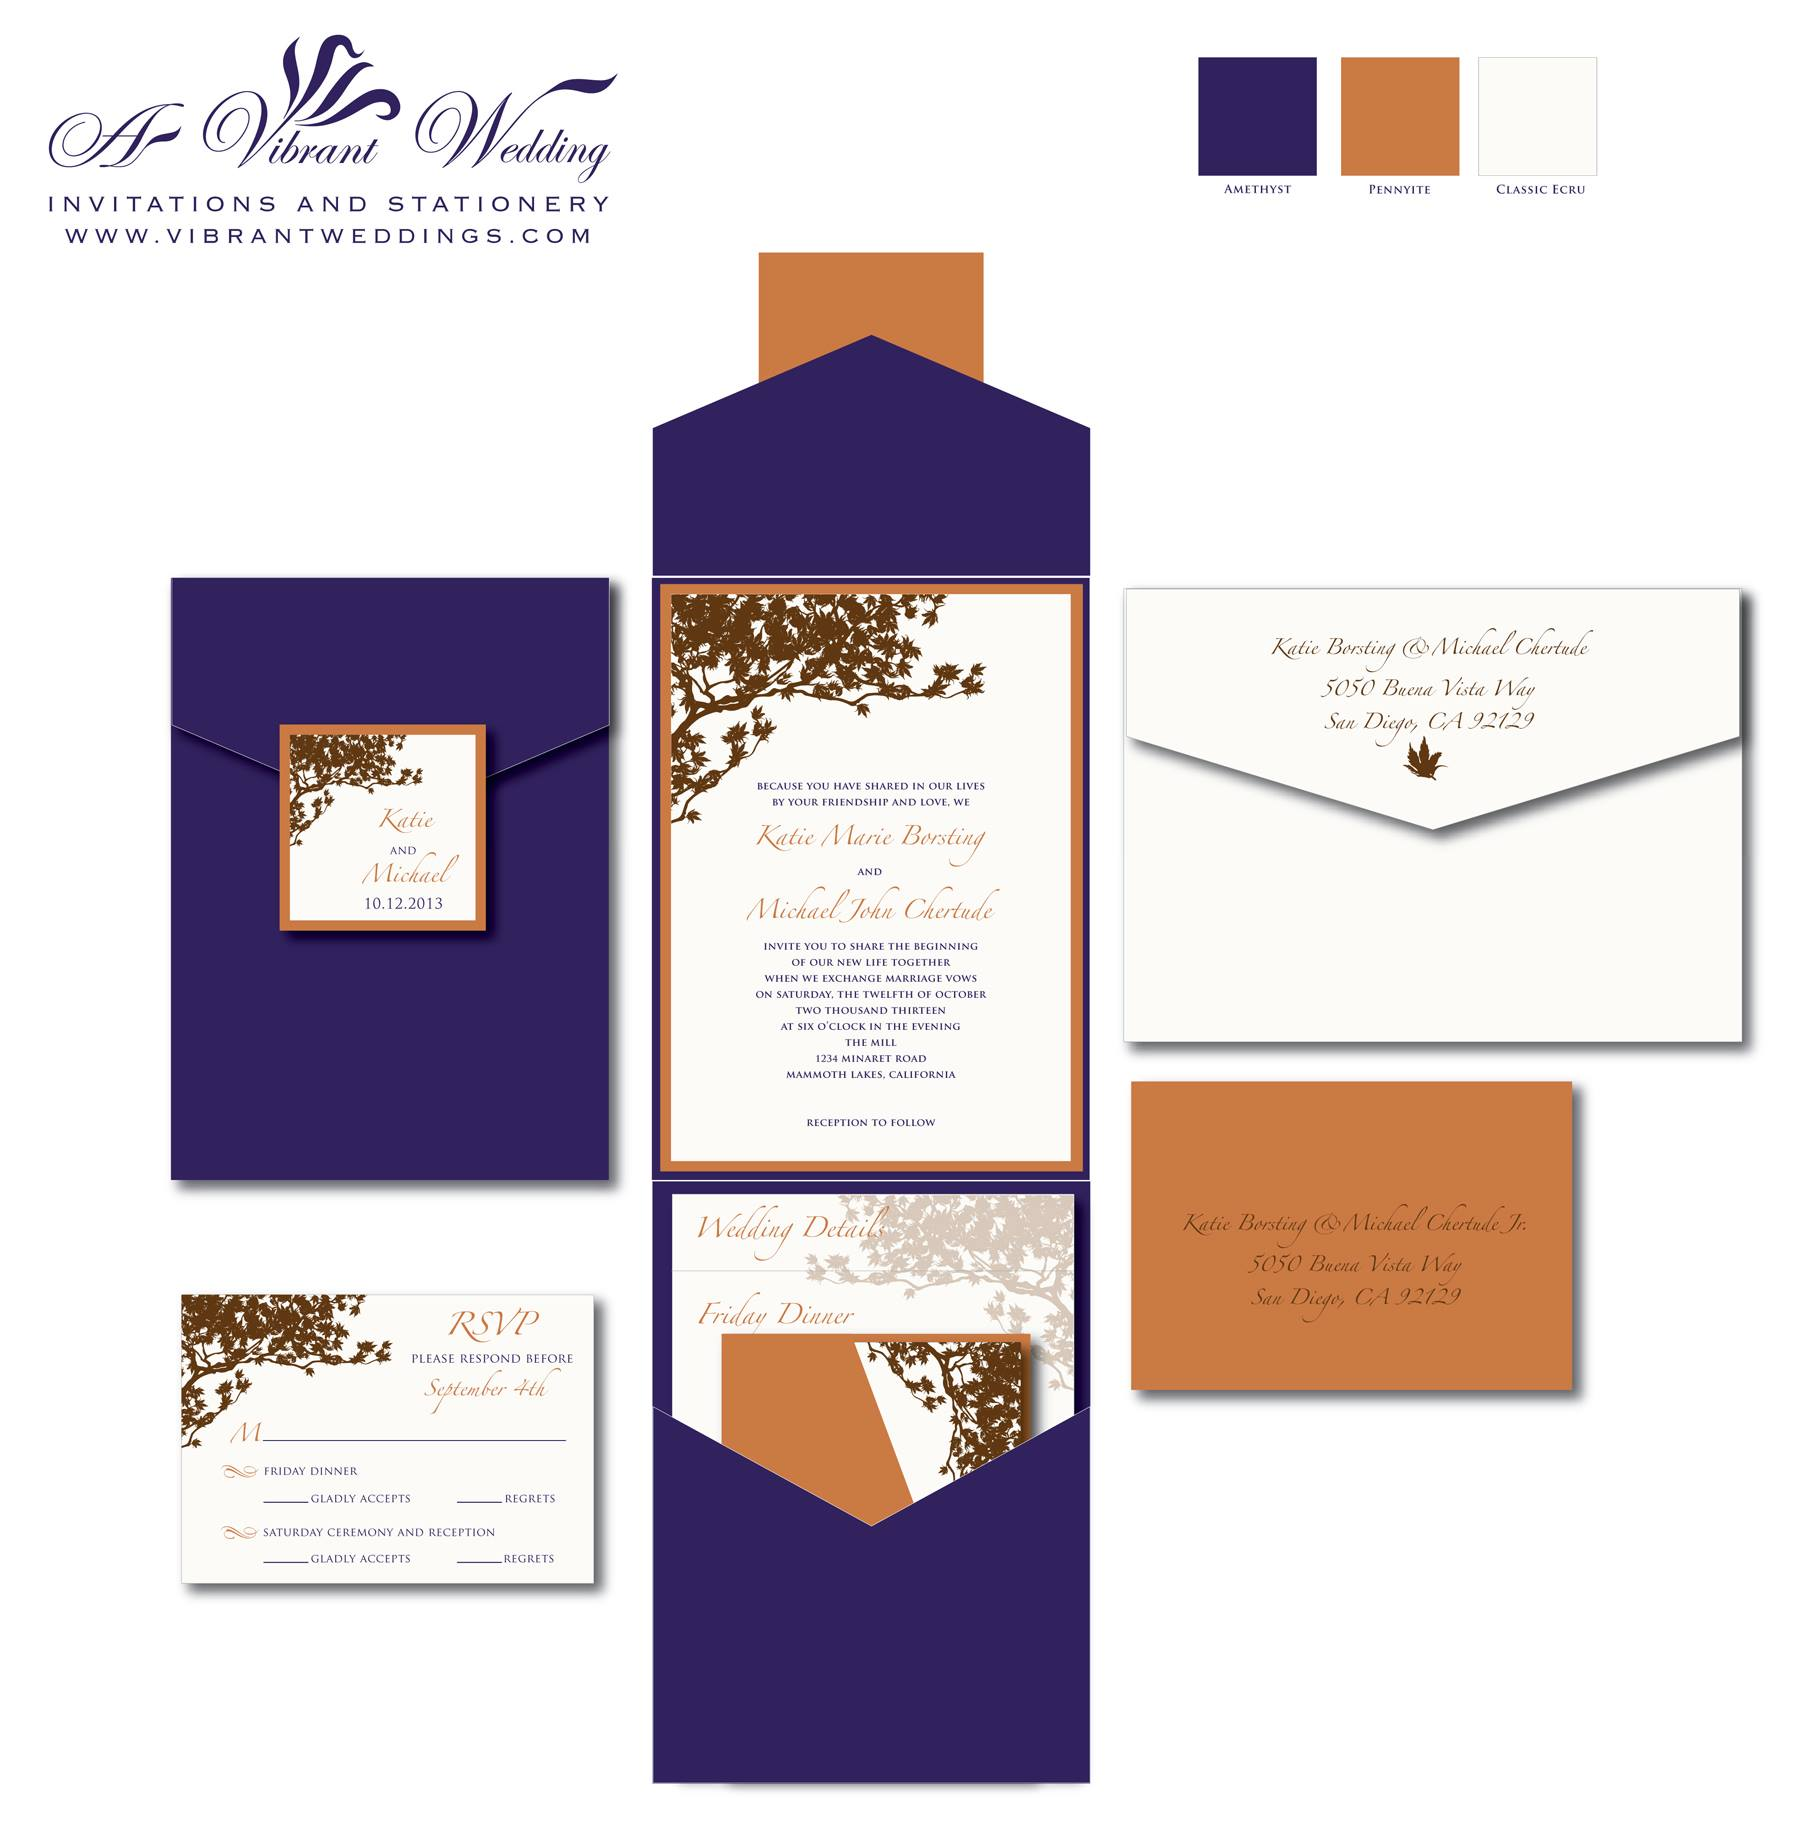 Rustic Theme Designs – A Vibrant Wedding